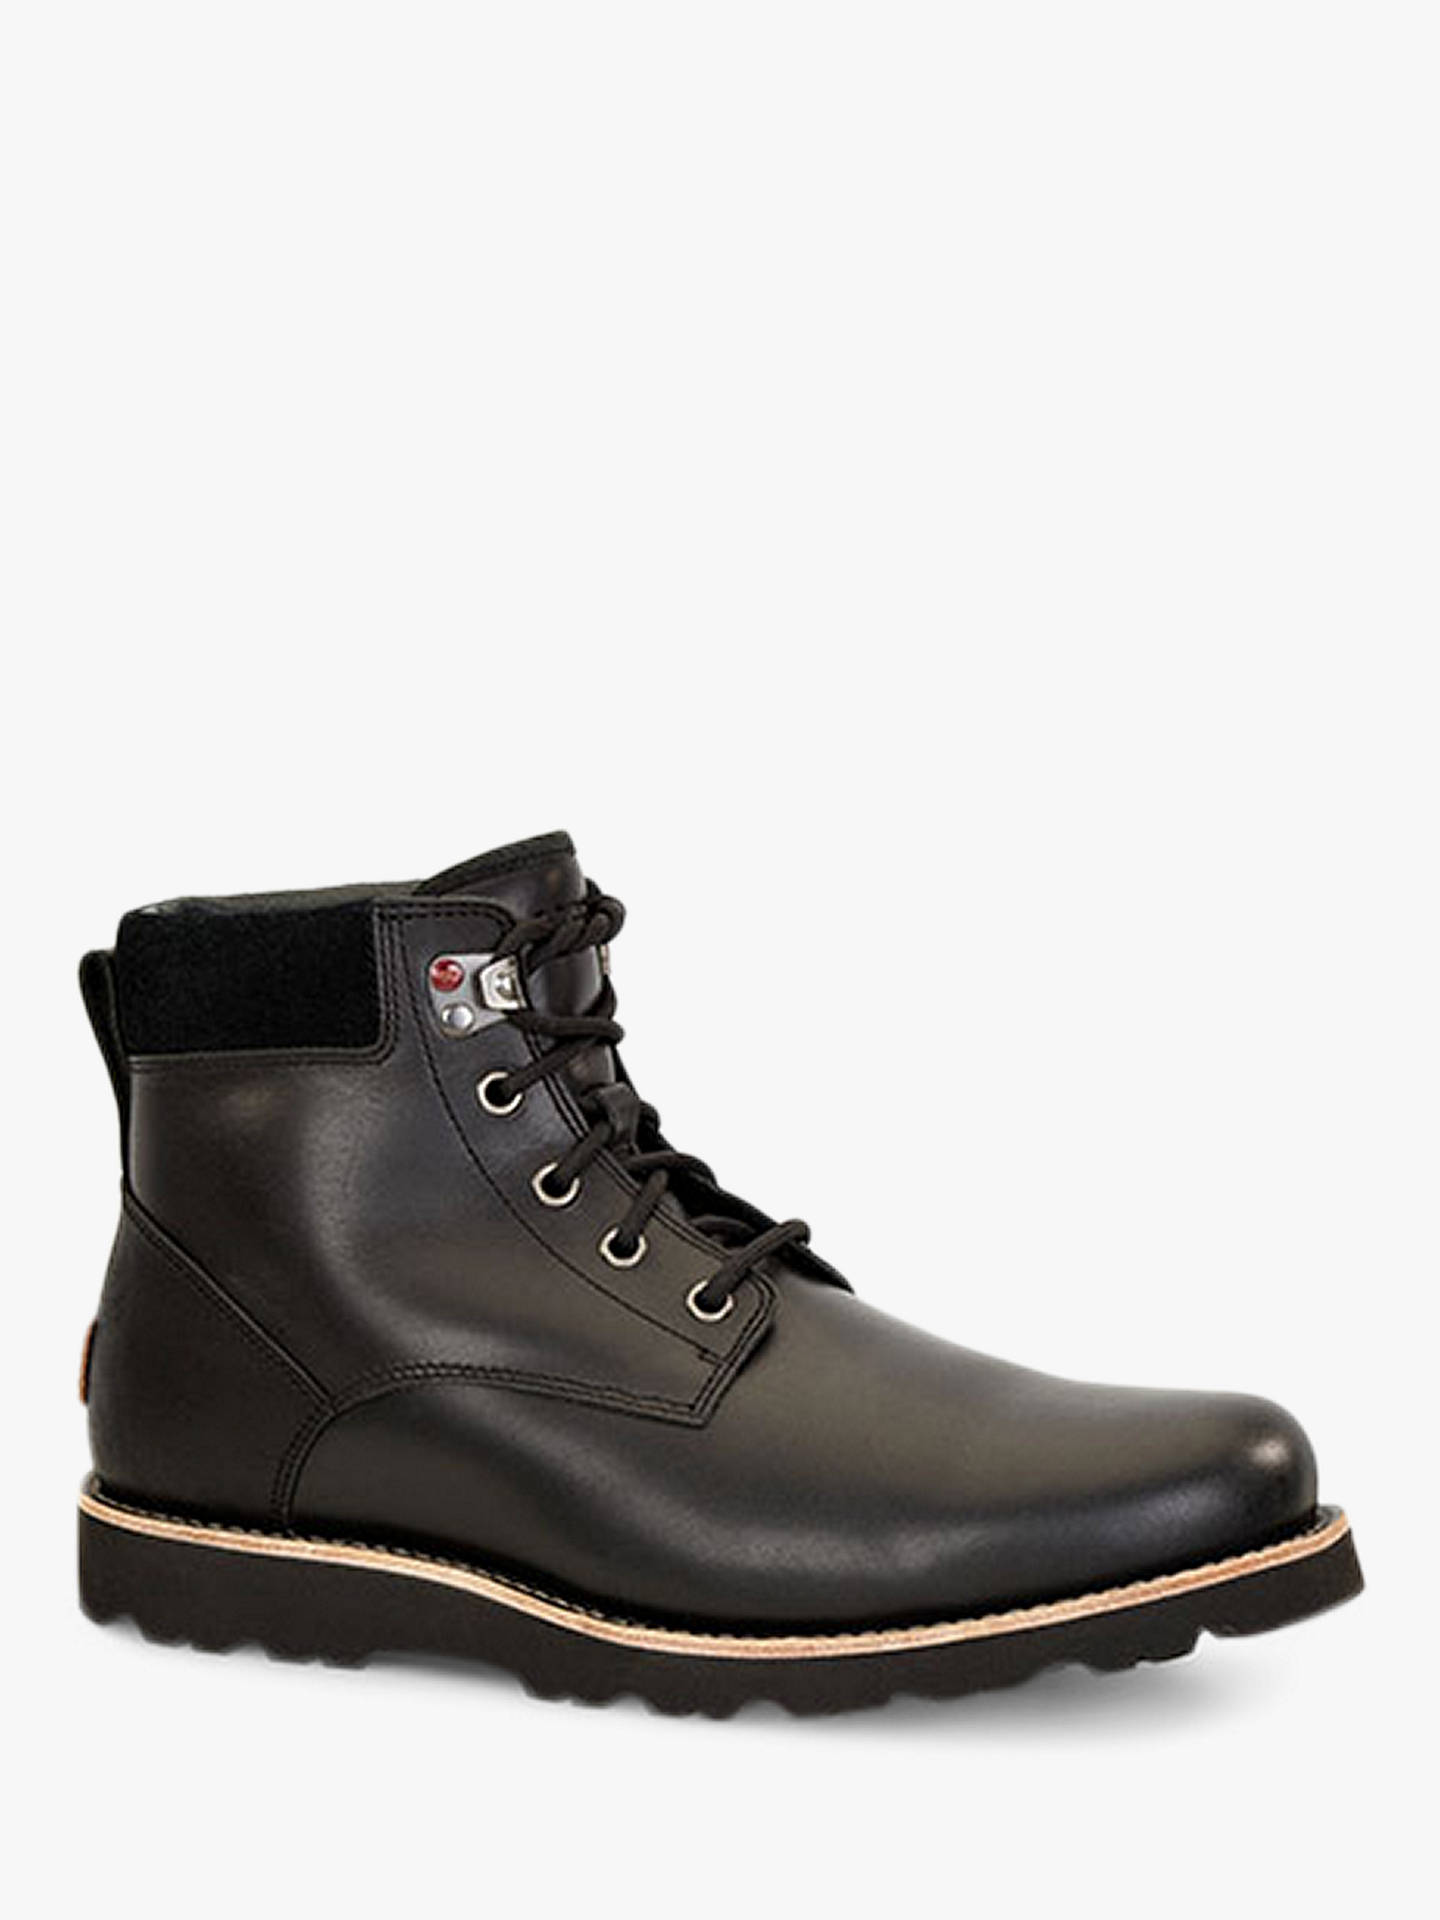 d39bf07b1b9 UGG Seton Boots | Stout at John Lewis & Partners